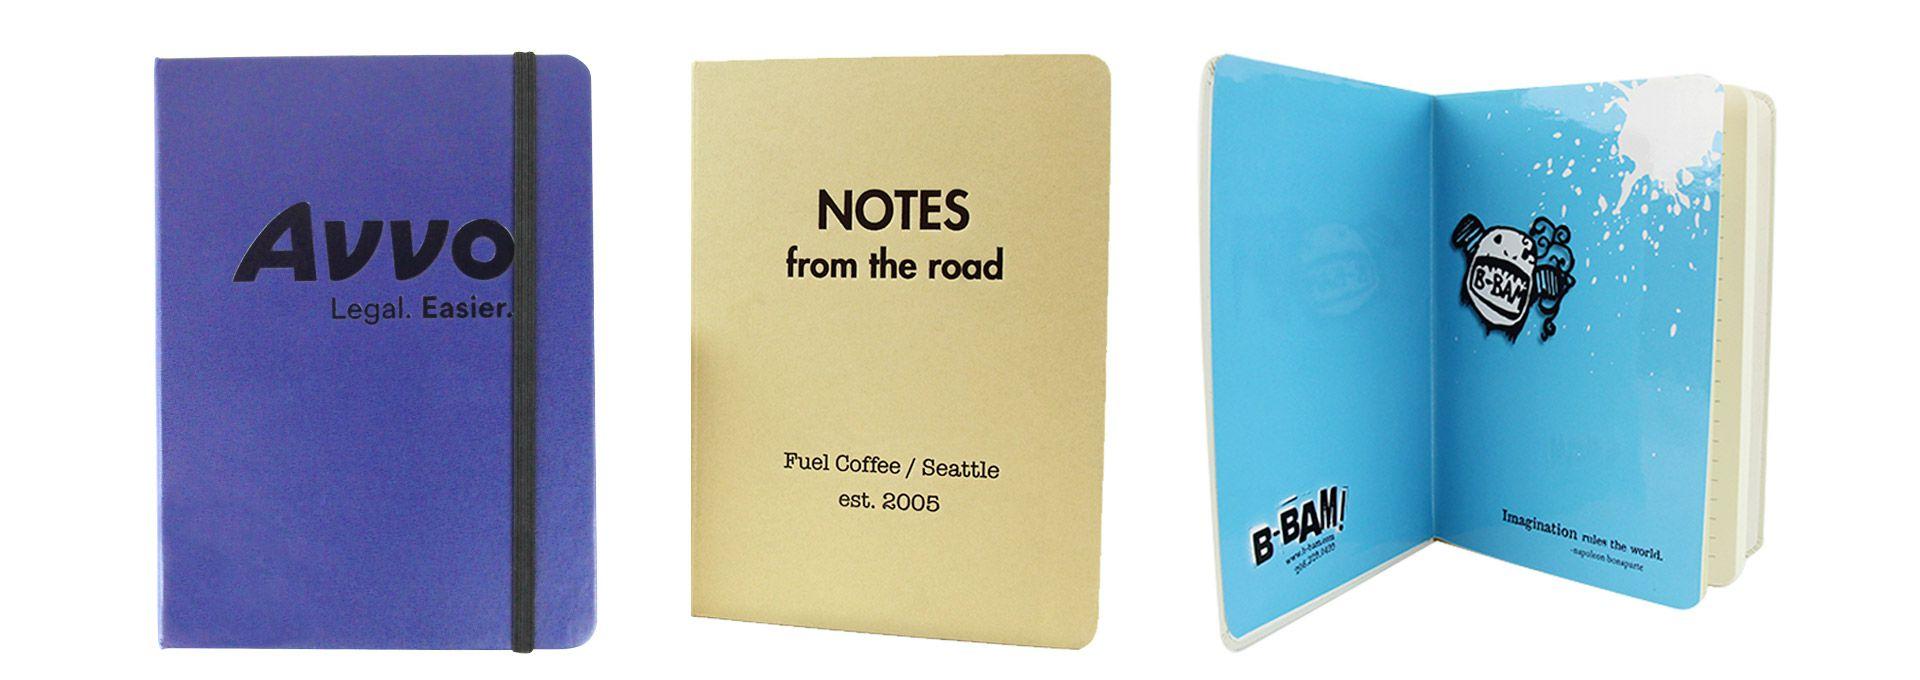 Custom Printed Promotional Corporate Logo Notebooks Seattle